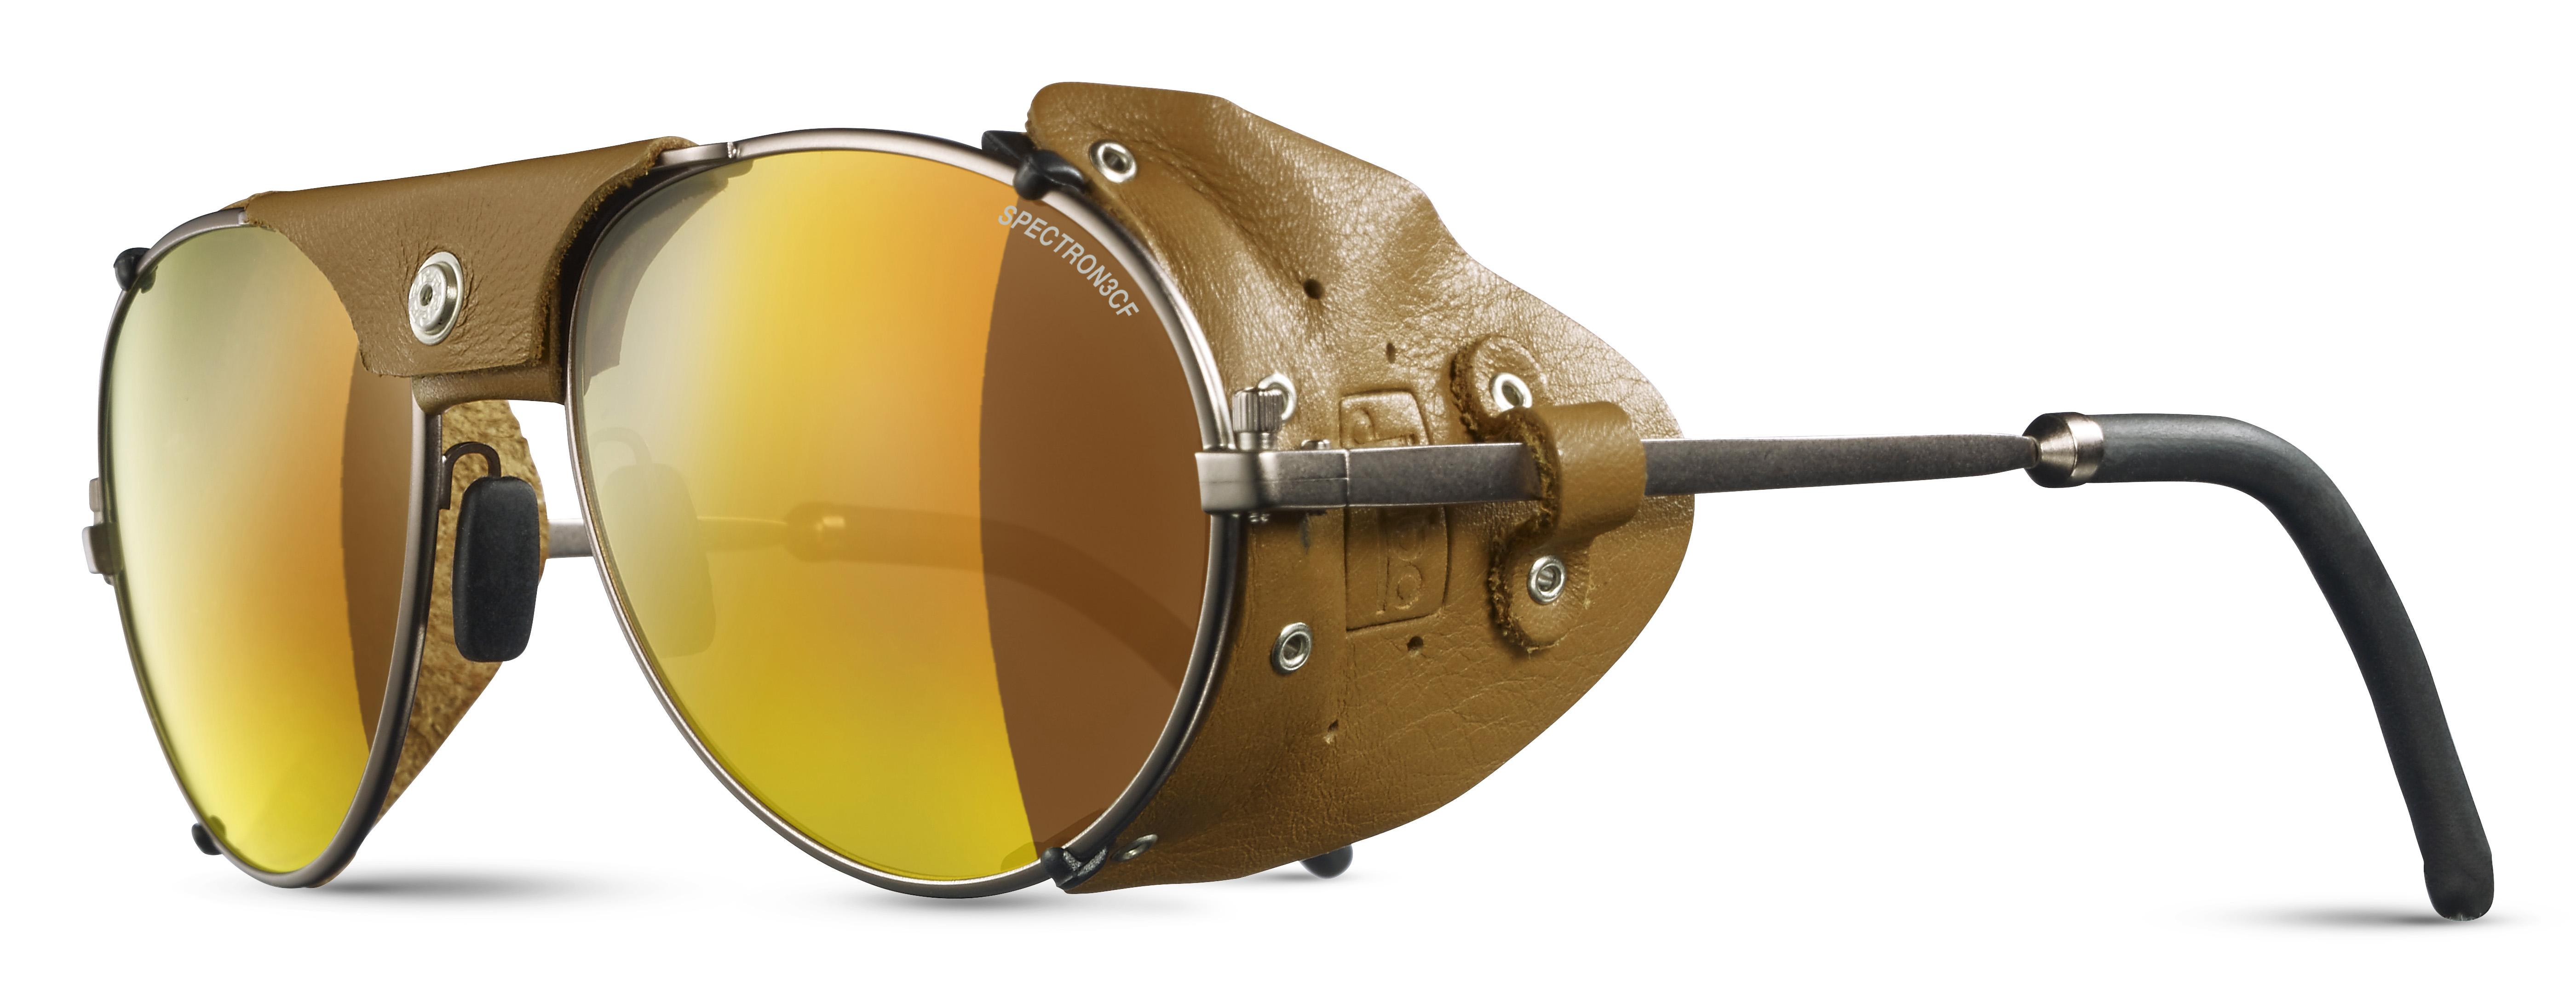 Image of   Julbo Cham Spectron 3Cf Sunglasses - Brass / Havana